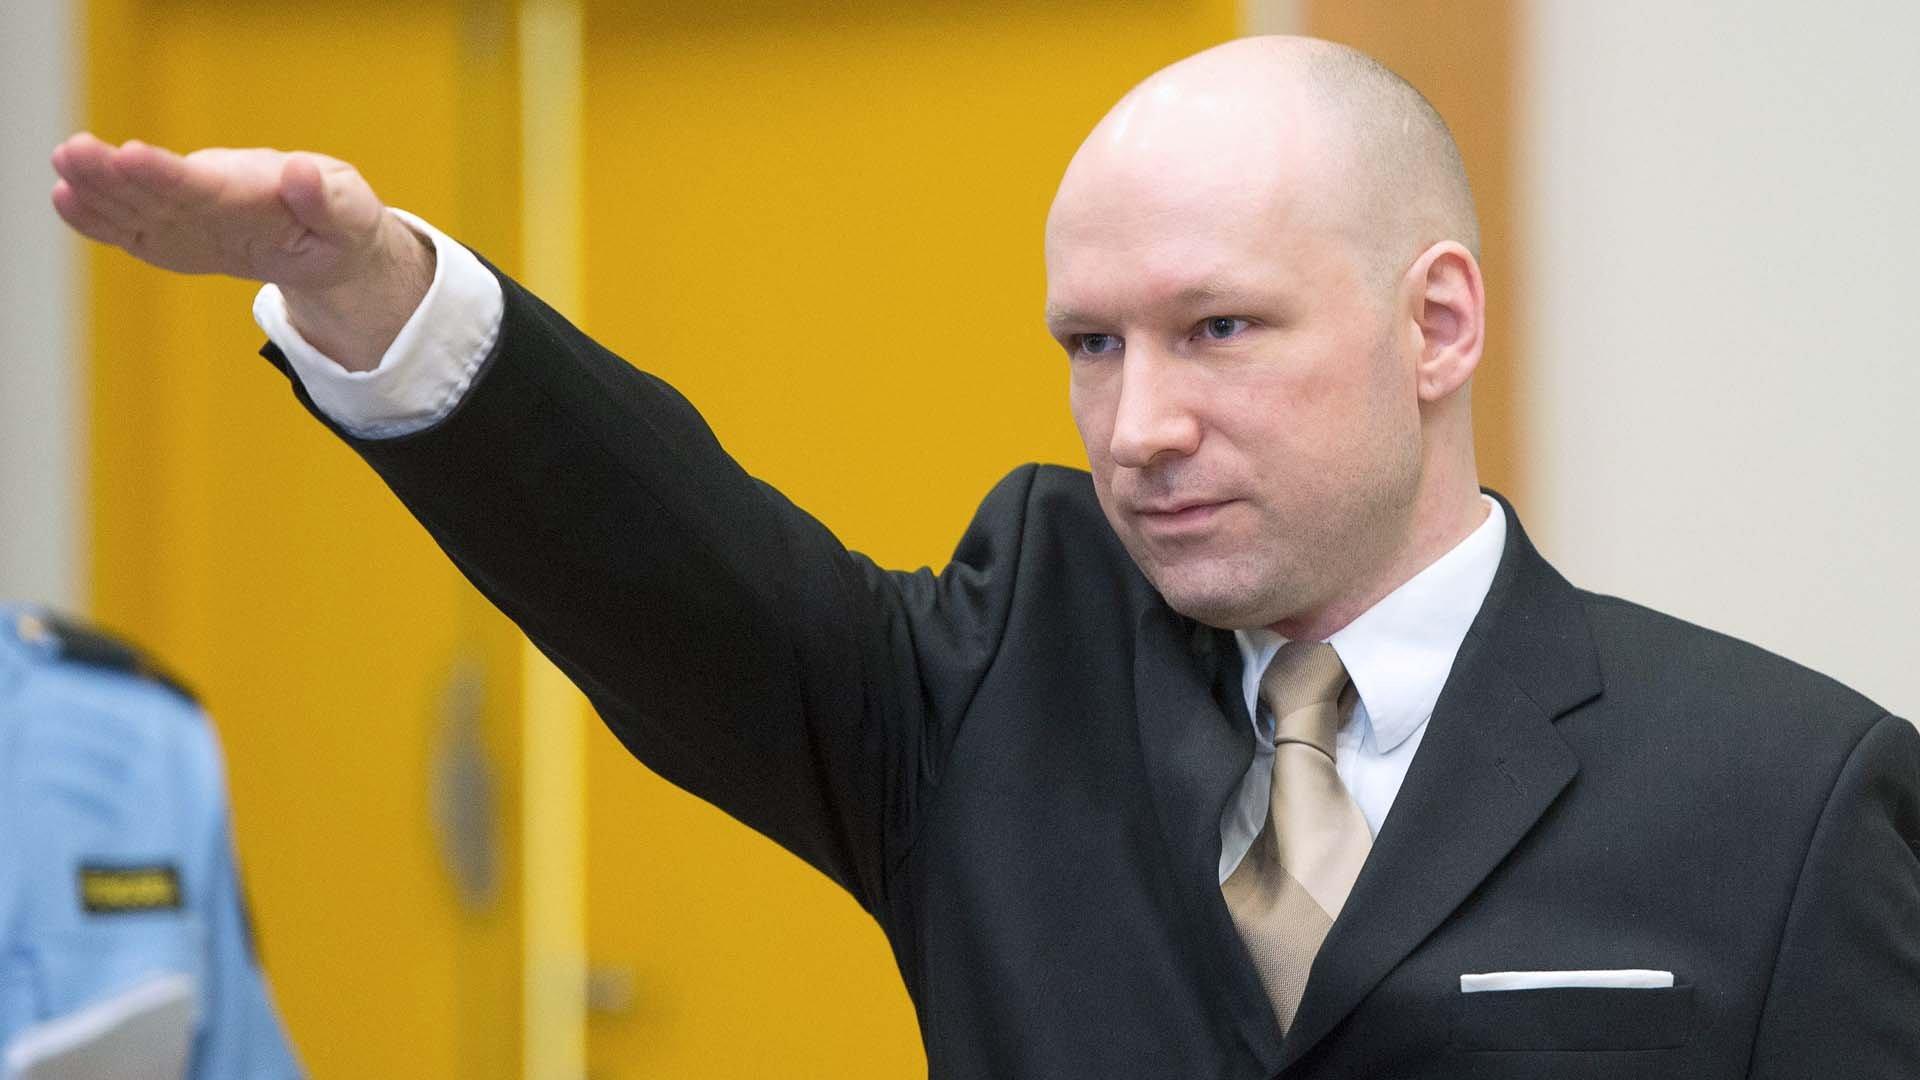 Anders Breivik è responsabile della strage di Utoya